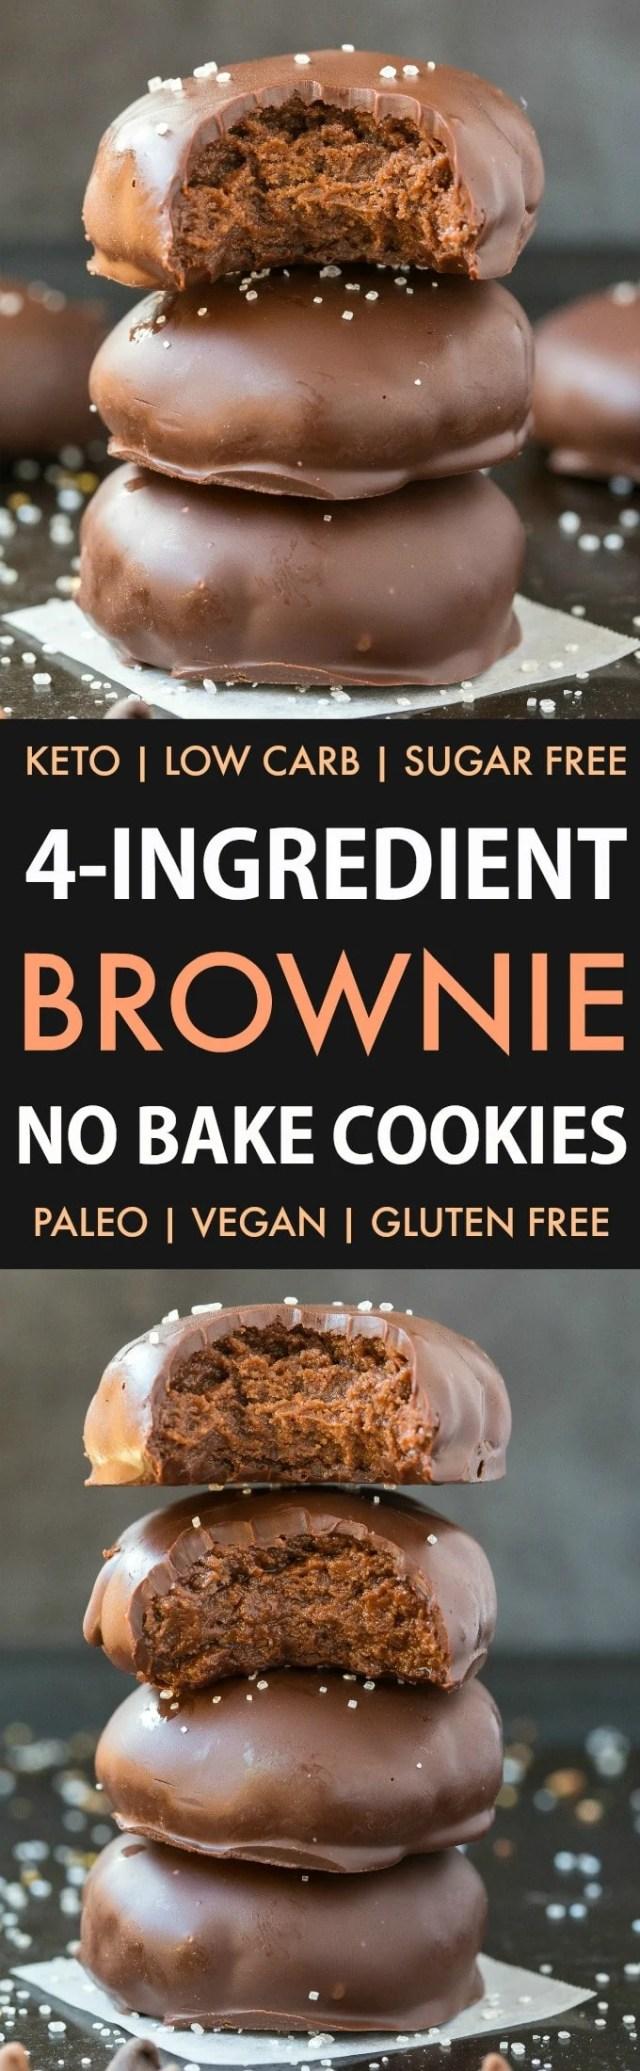 4-Ingredient No Bake Brownie Batter Cookies in a collage